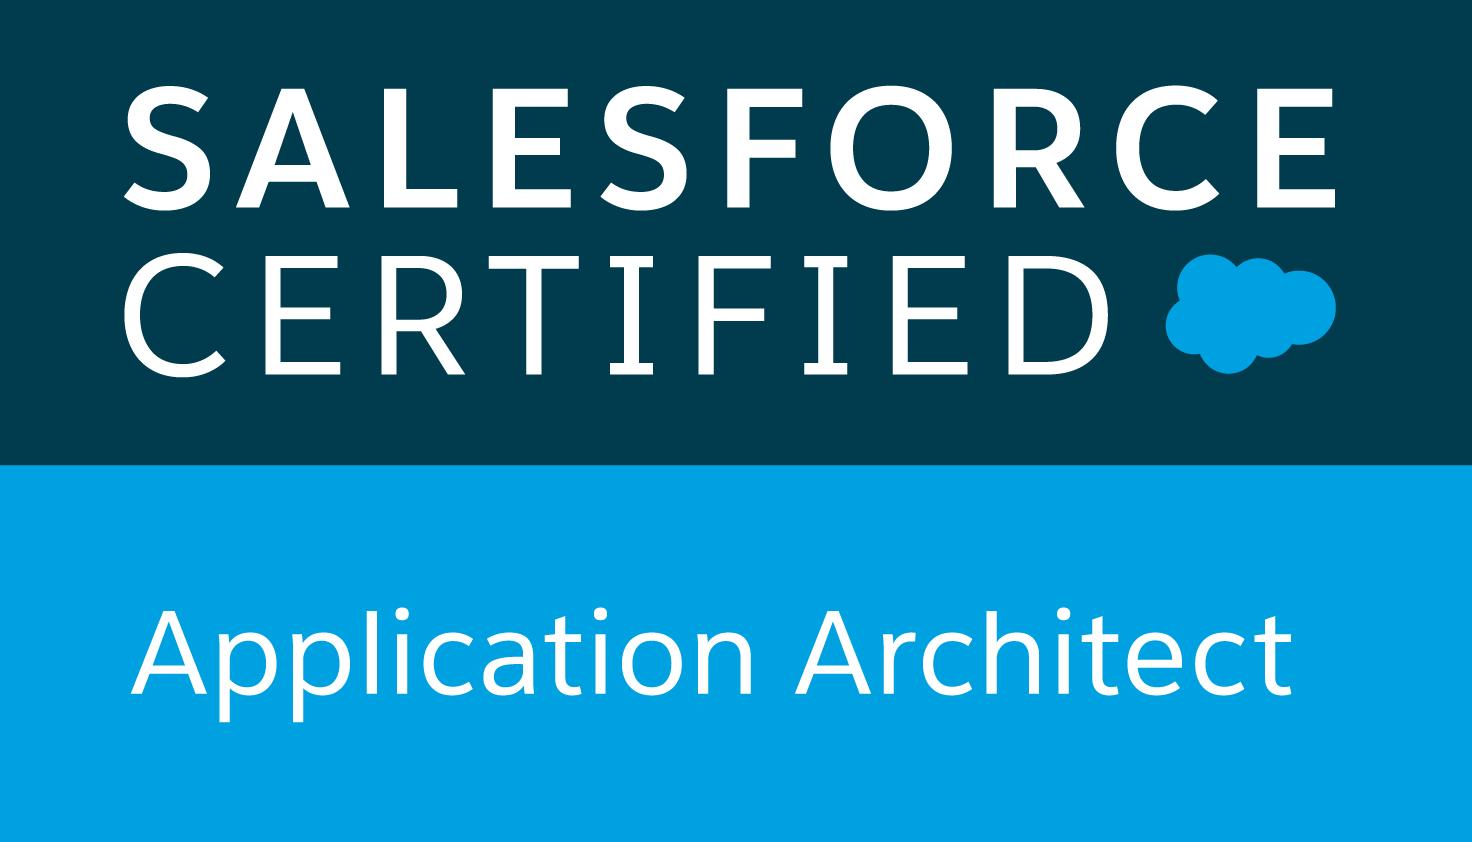 Application Architect